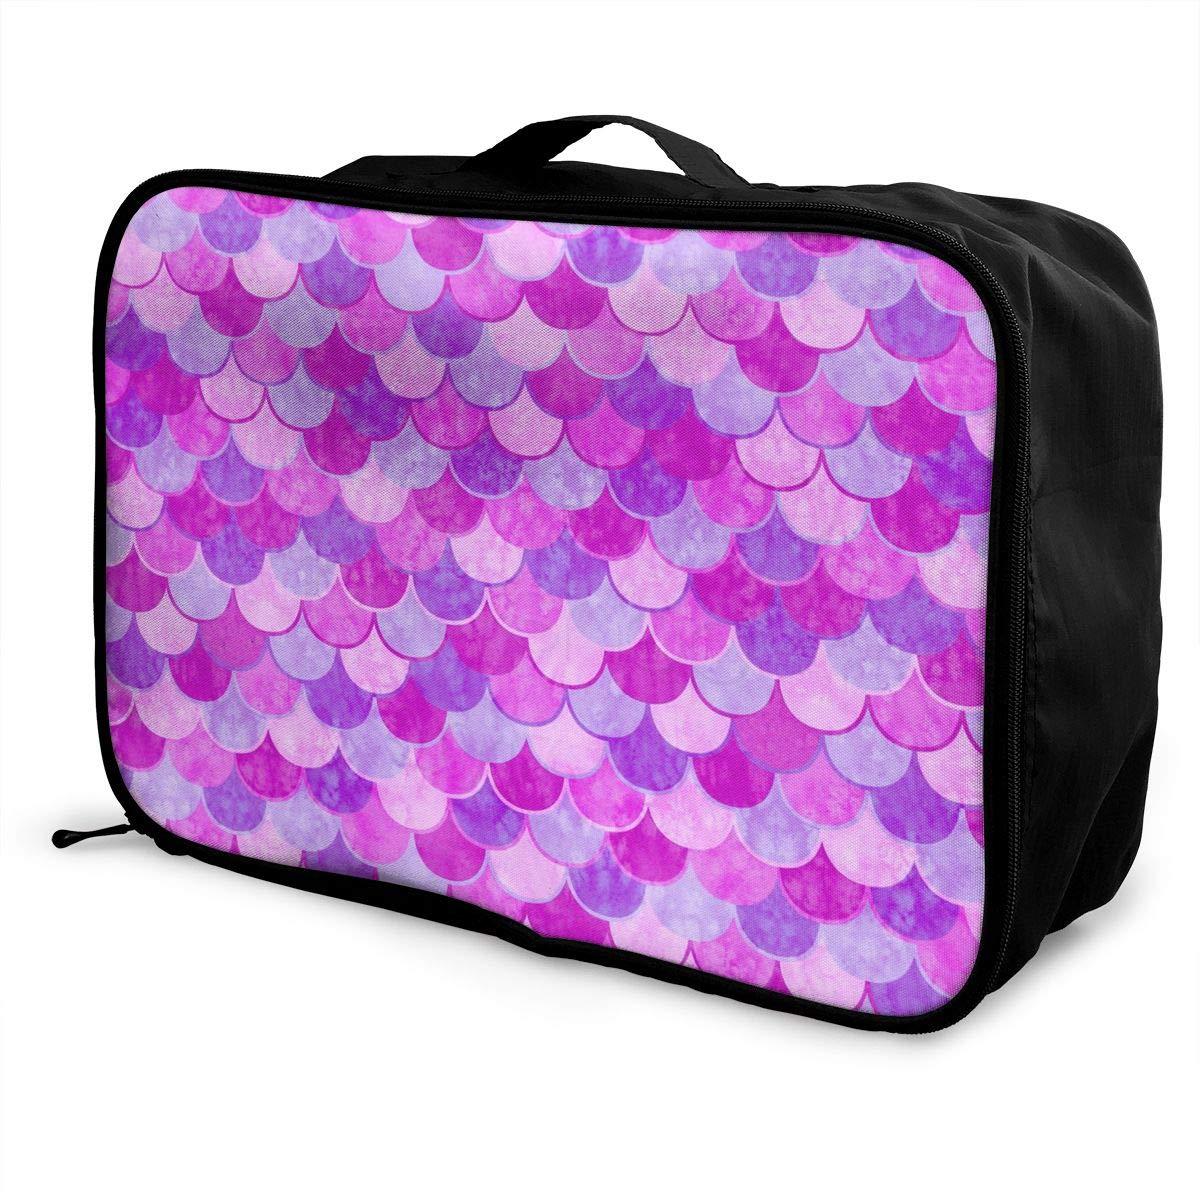 Pink Mermaid Scale Travel Duffel Bag Casual Large Capacity Portable Luggage Bag Suitcase Storage Bag Luggage Packing Tote Bag Weekend Trip